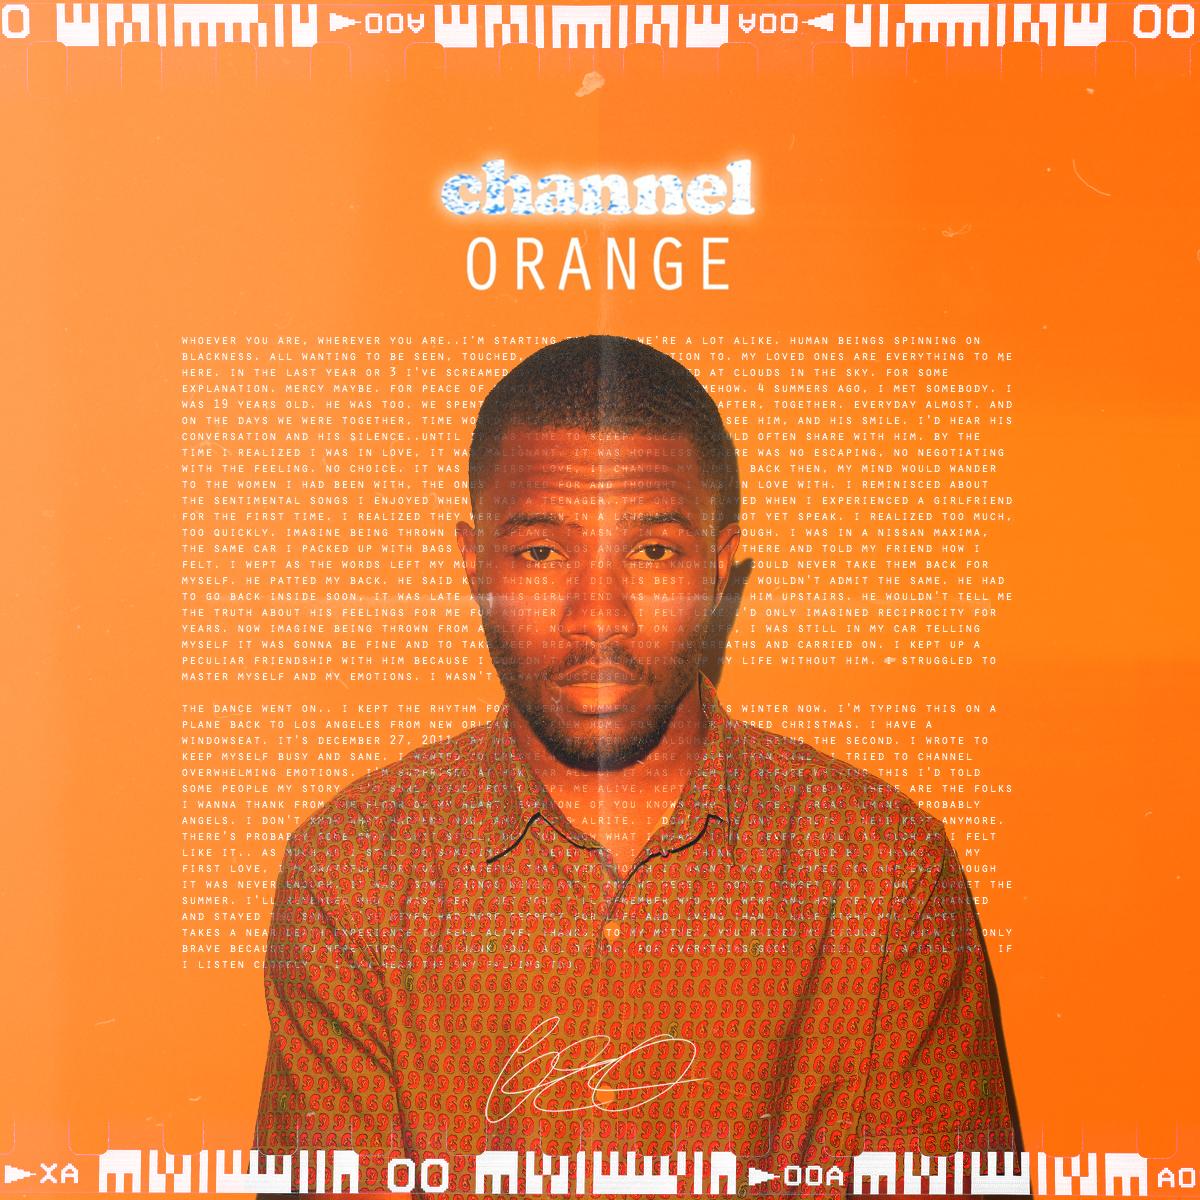 frank-ocean-channel-orange | AudioMelody